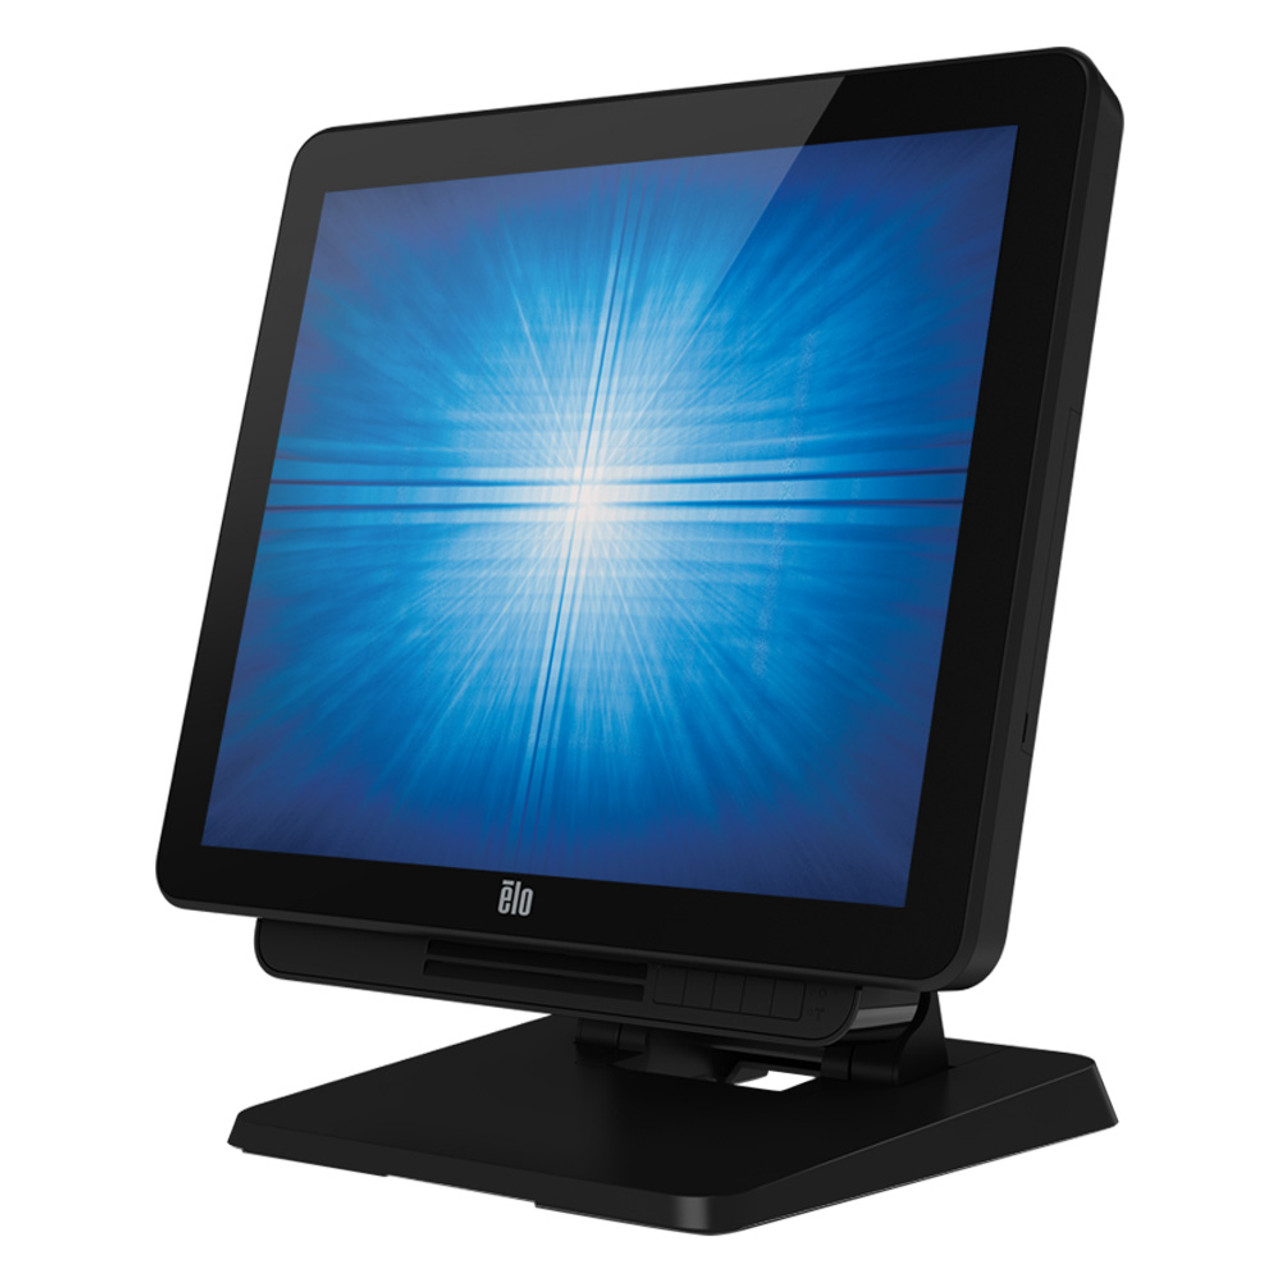 Elo X-Series Touchscreen Computer